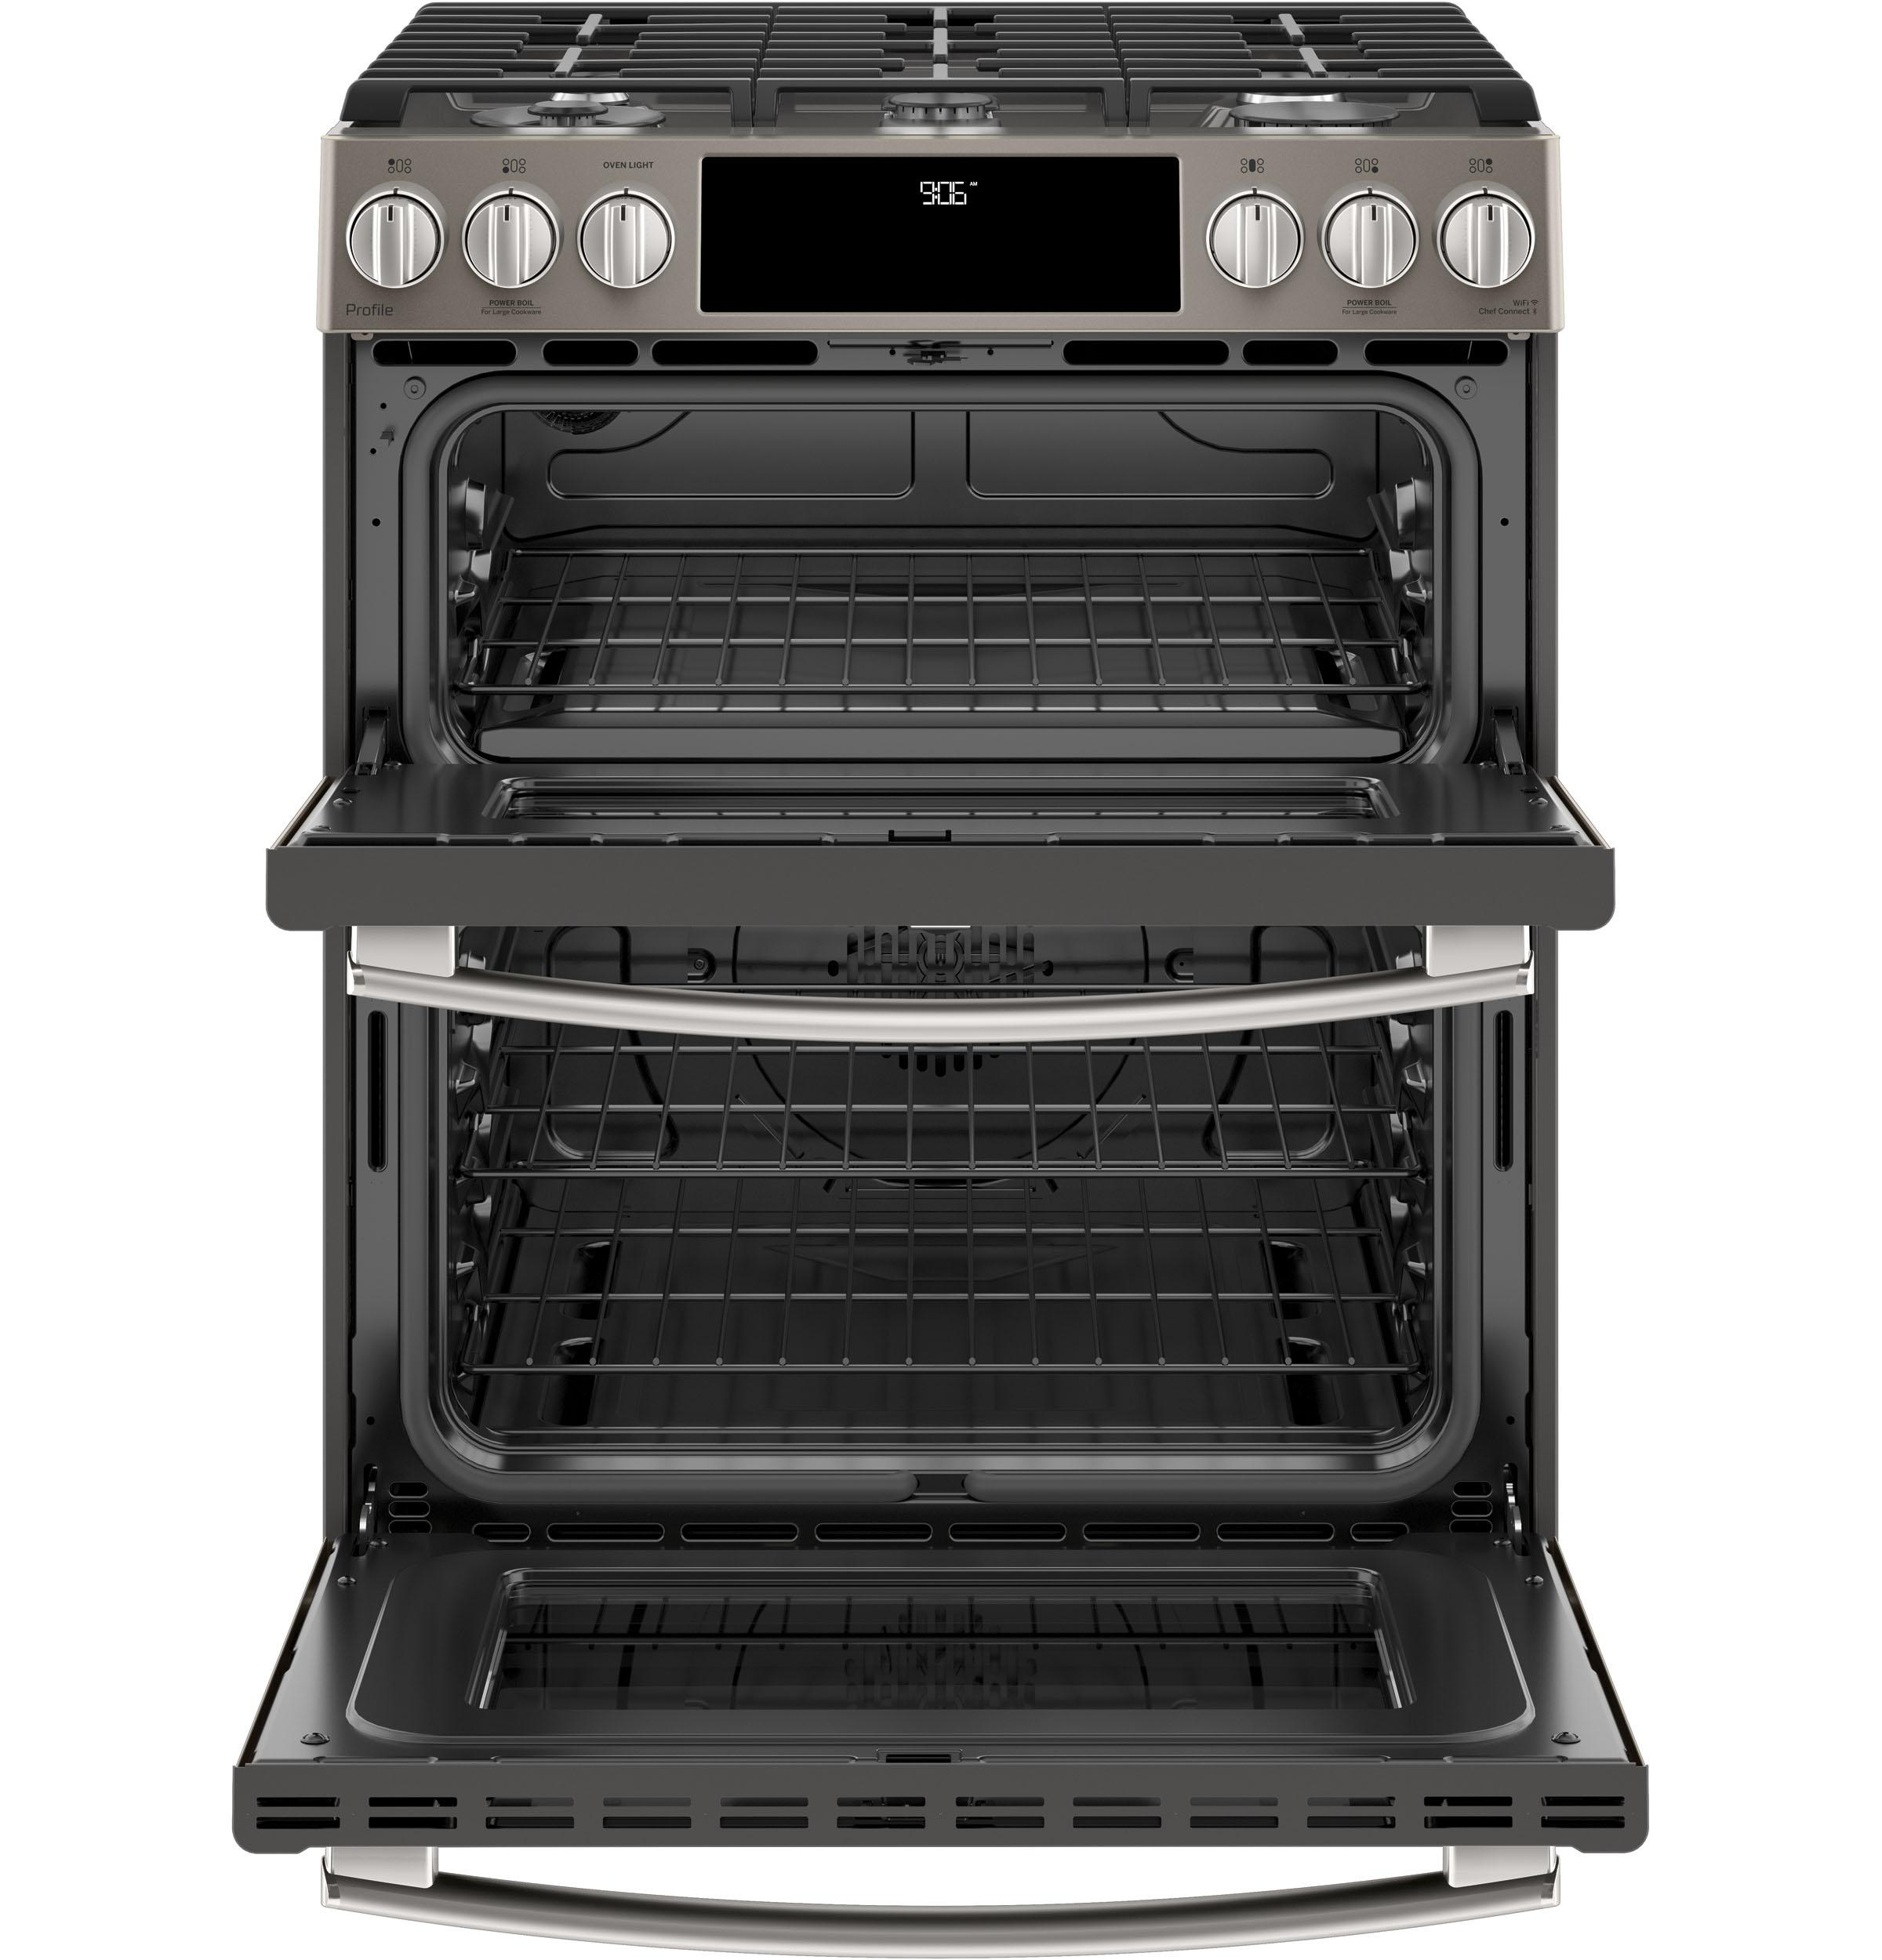 ge profile series 30 slide in front control gas double oven convection range ge slide in. Black Bedroom Furniture Sets. Home Design Ideas